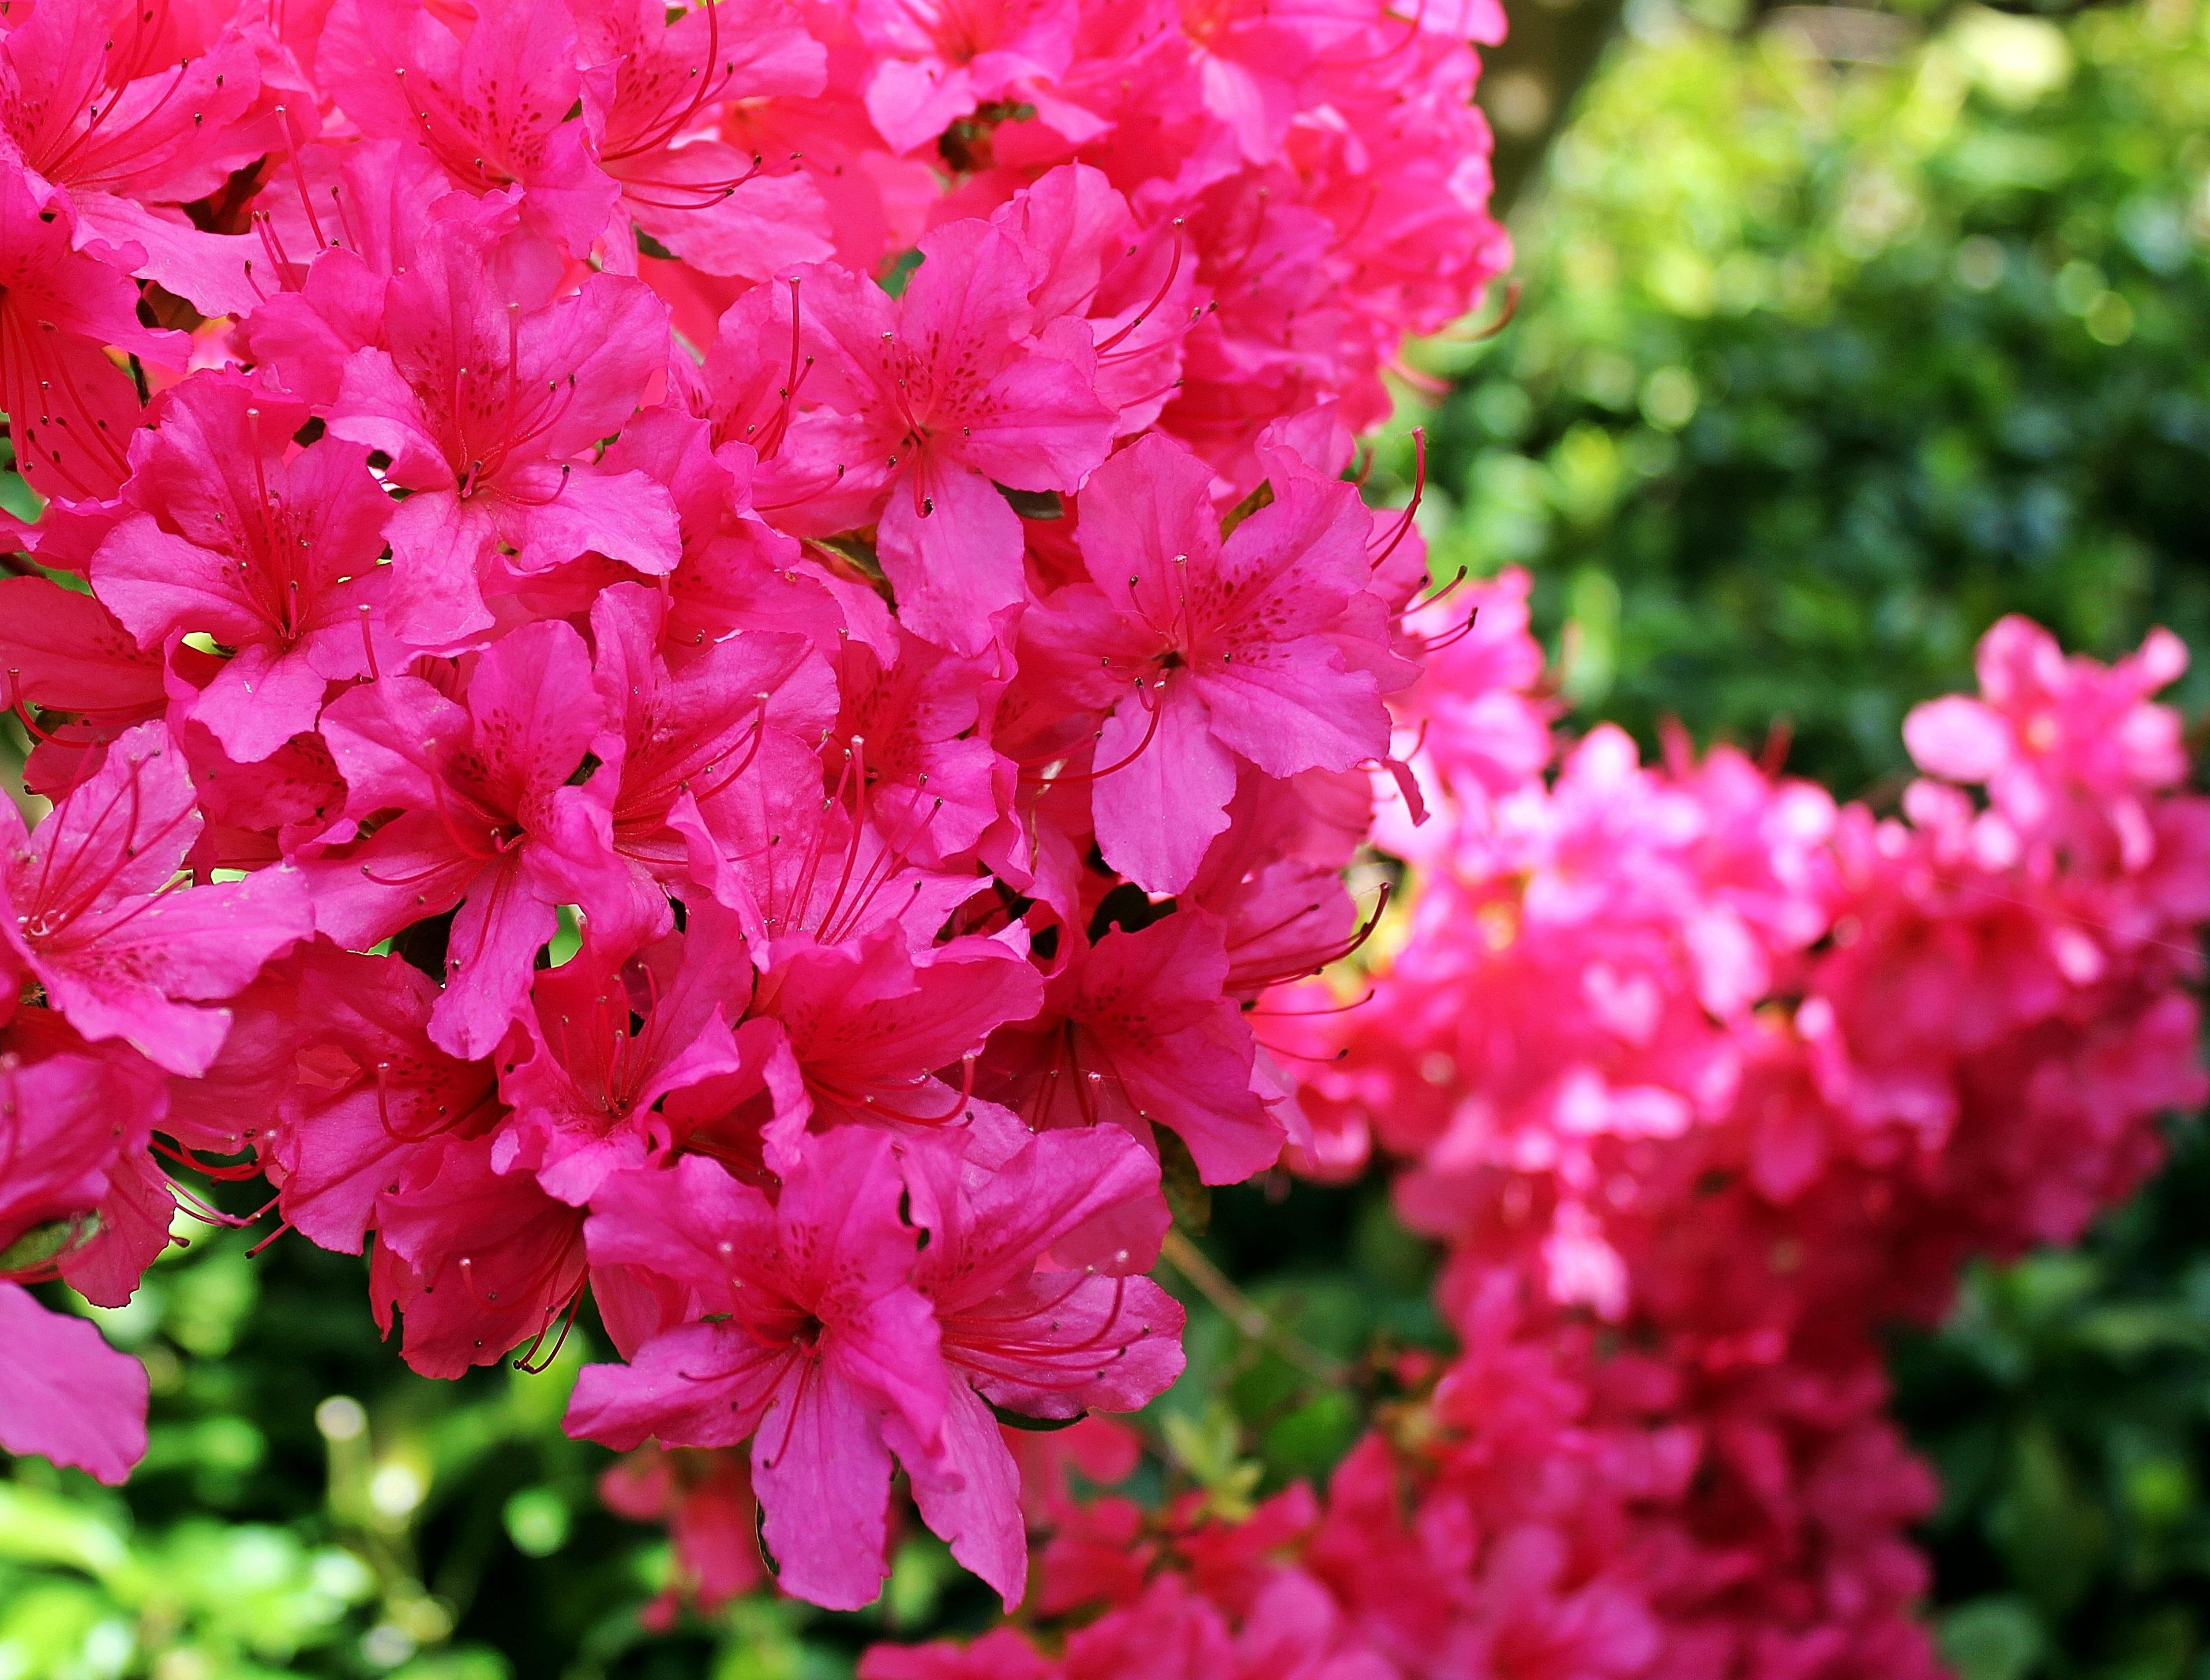 Free images blossom flower petal summer bush spring garden blossom plant flower petal summer bush spring garden pink flora flowers background shrub bright rhododendron azalea mightylinksfo